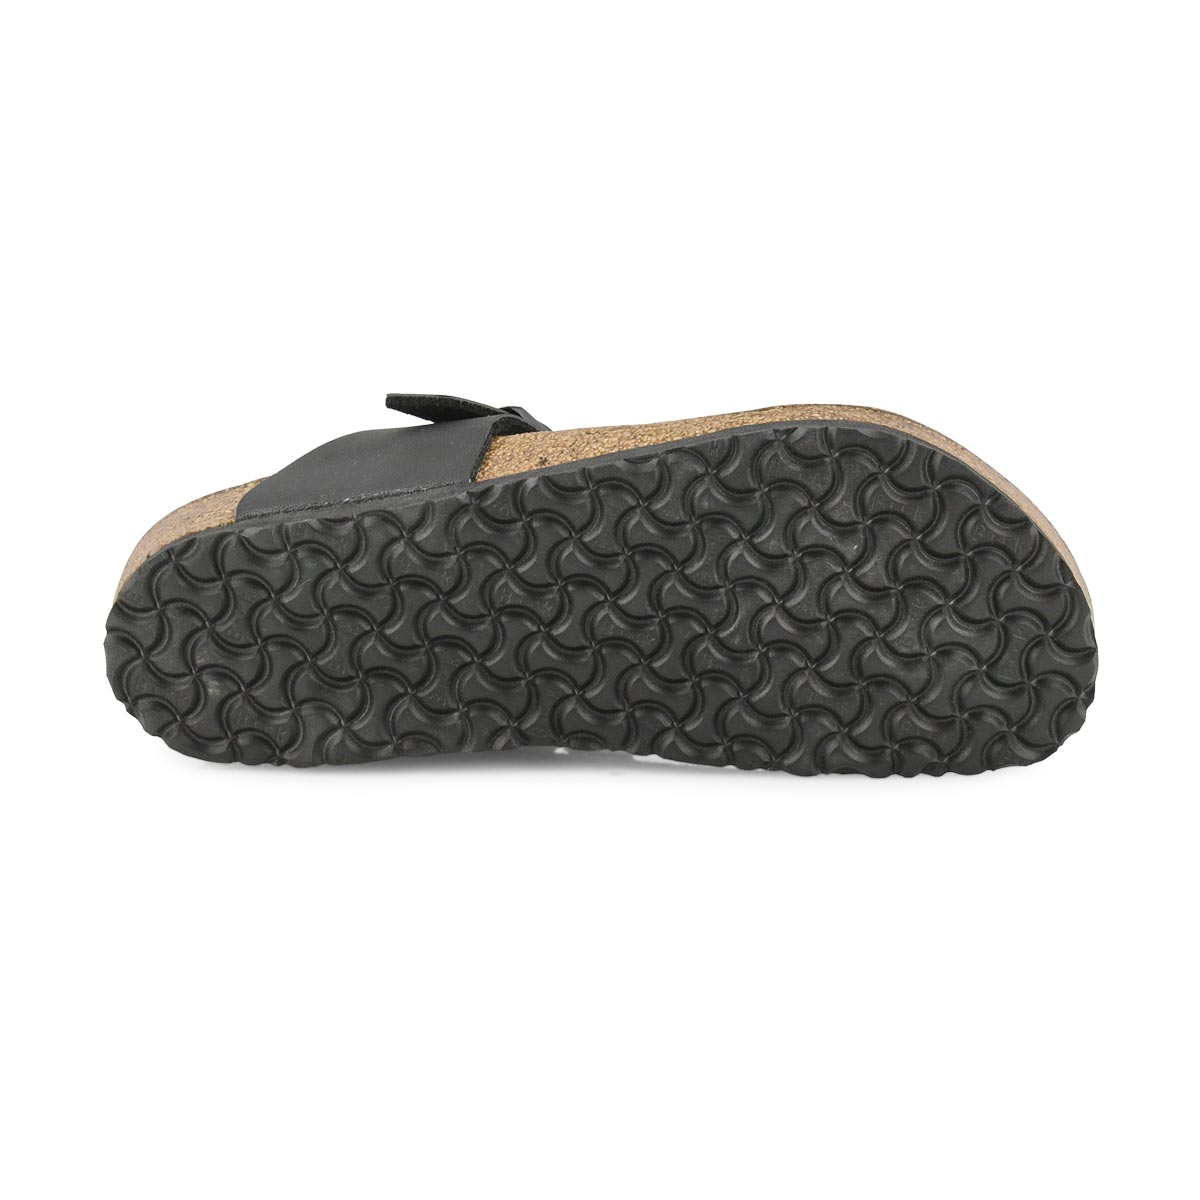 Grls Gizeh BF black thong sandal-N